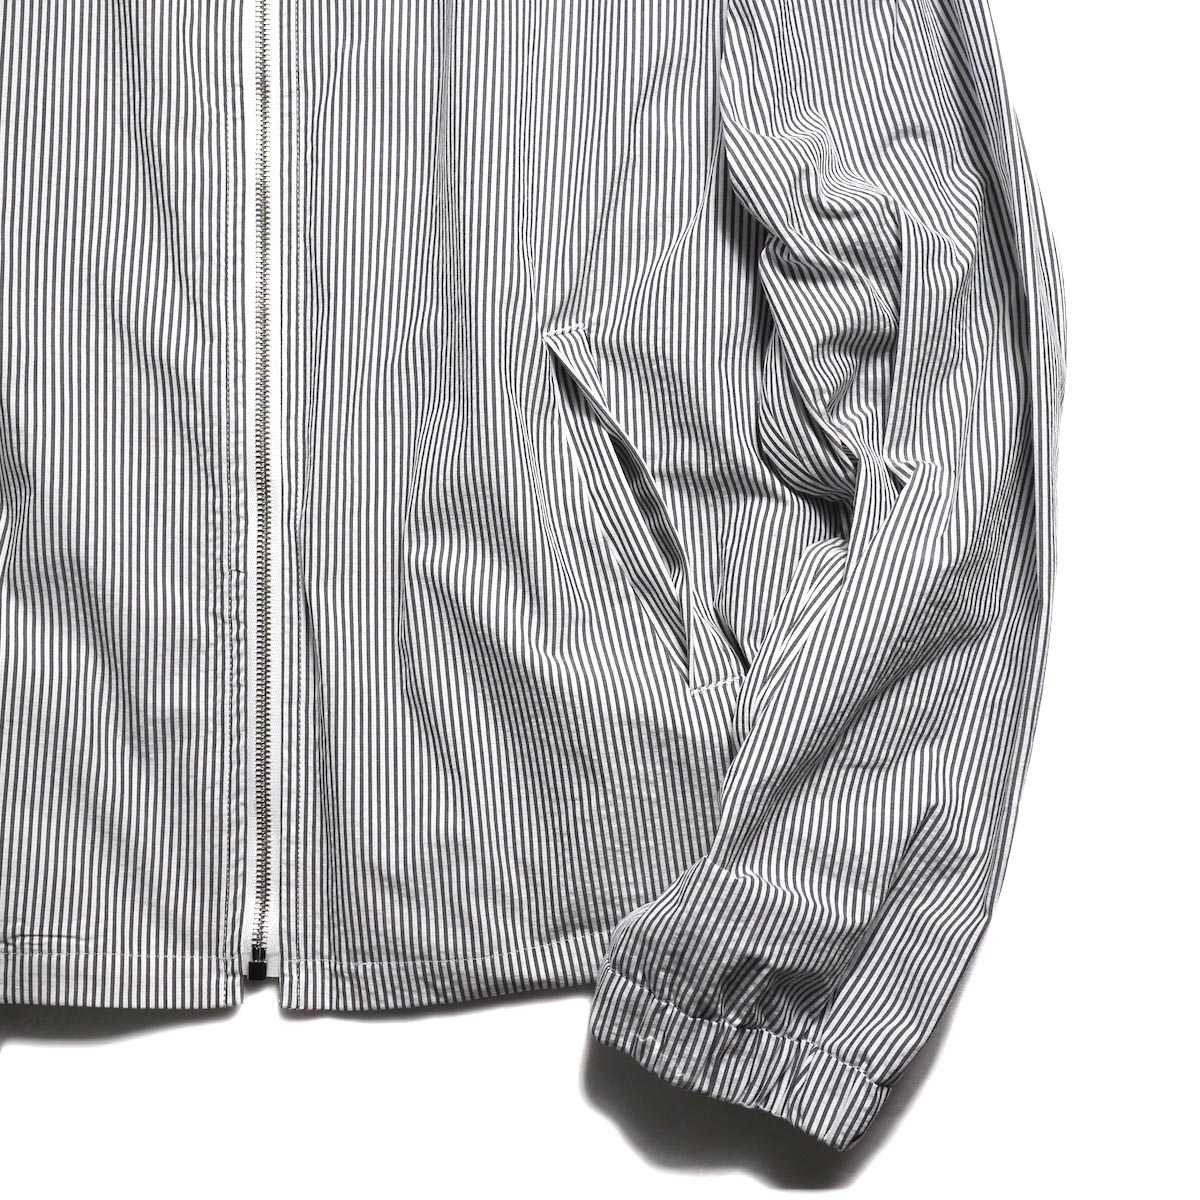 UNUSED / US1564 Stripe Drizzler Jacket. (Black×White) 袖、裾